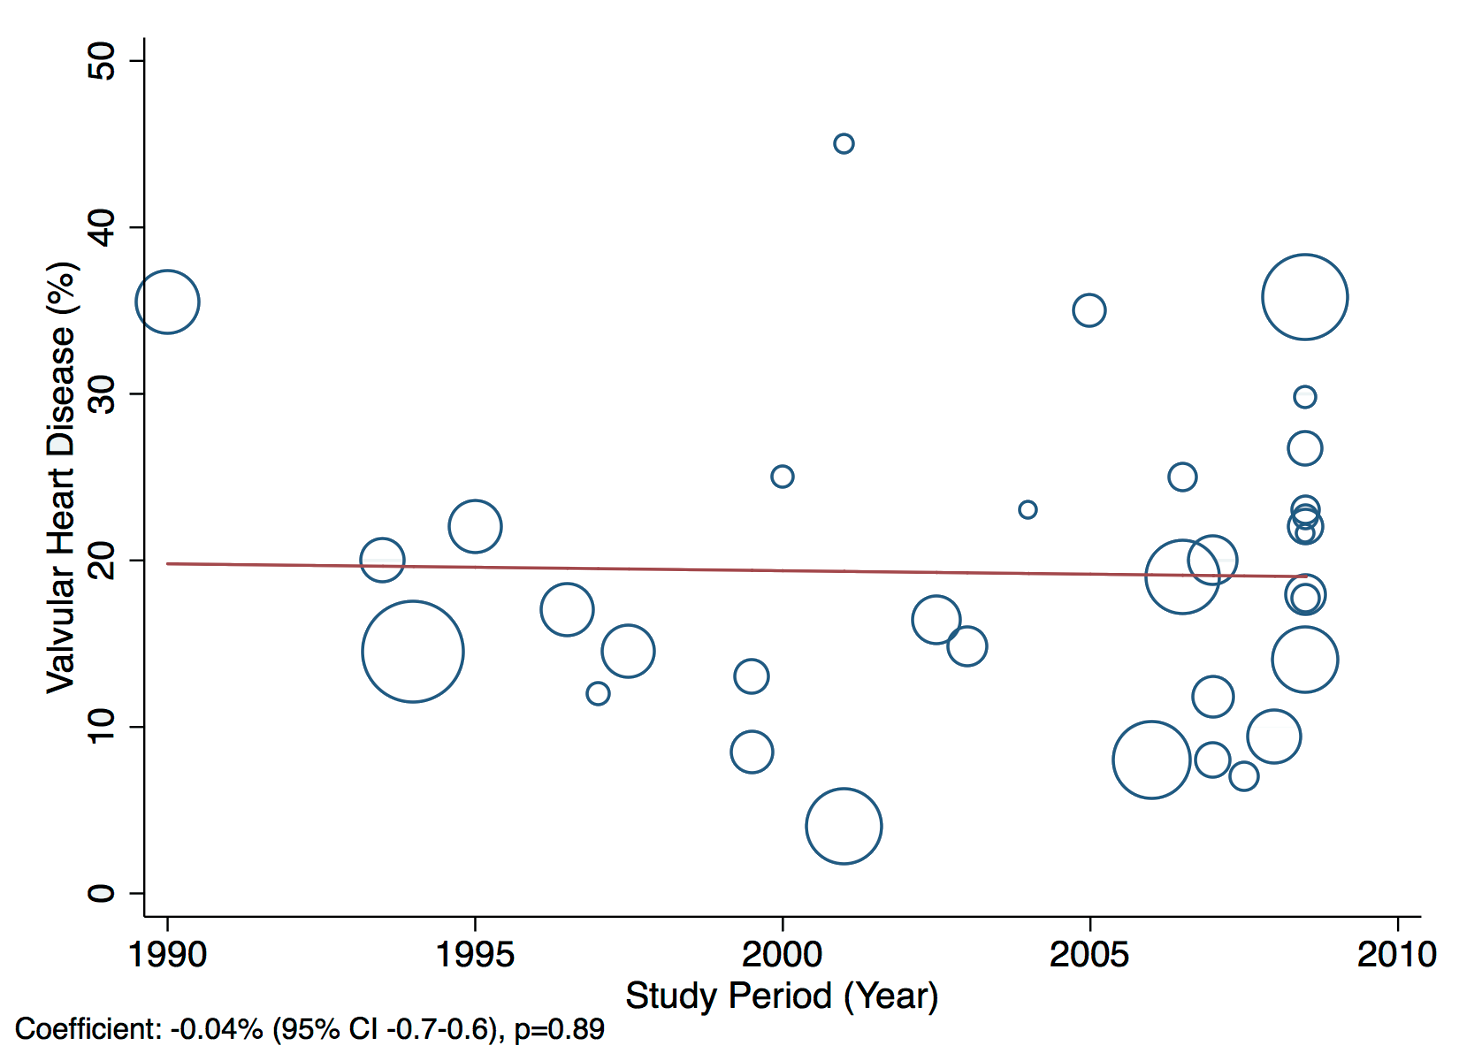 Meta-regression of valvular heart disease against study period.